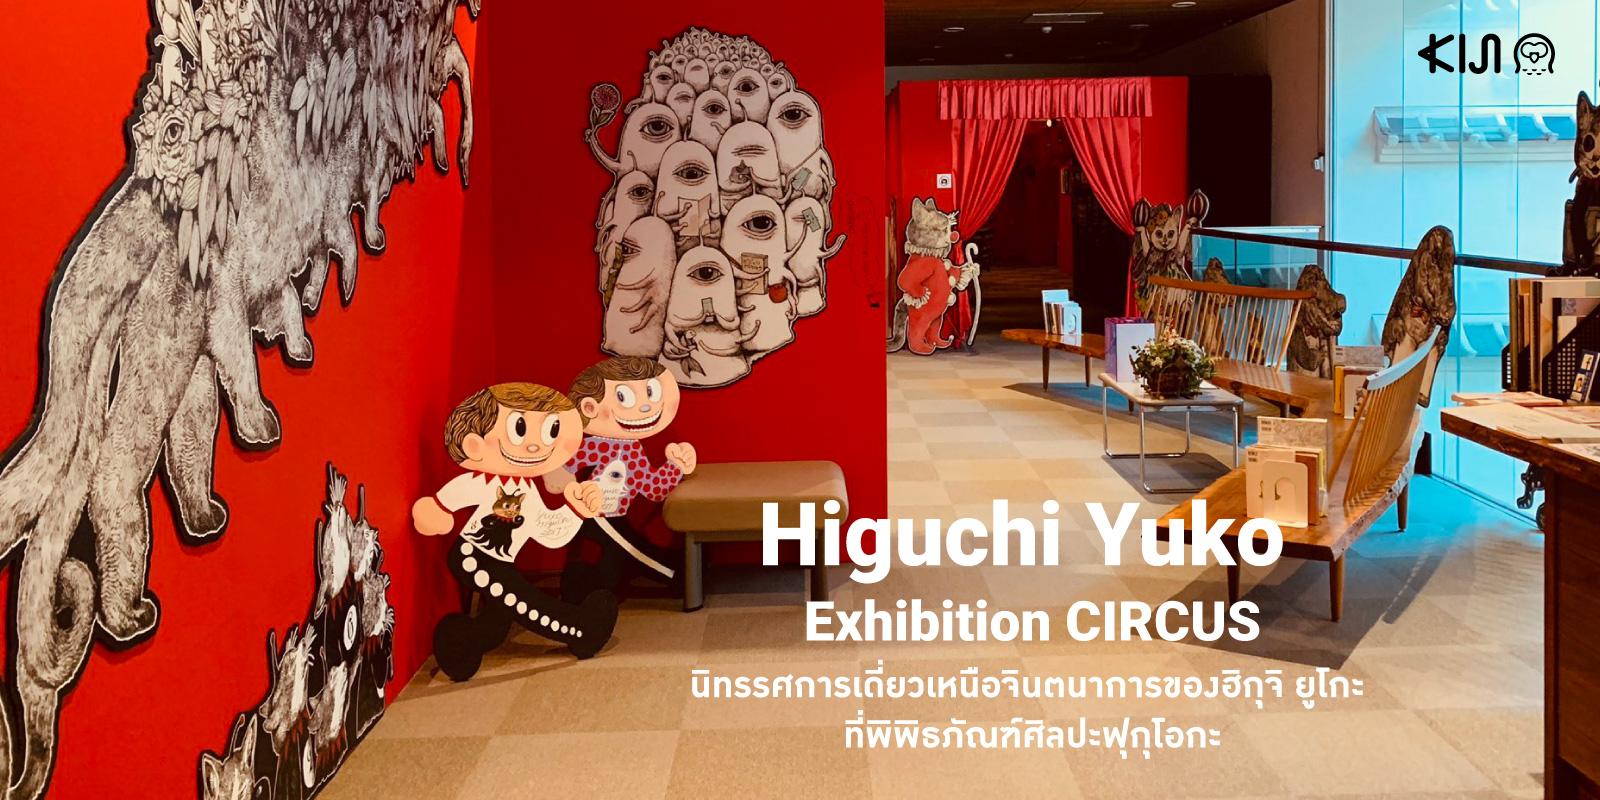 Higuchi Yuko Exhibition CIRCUS, จังหวัดฟุกุโอกะ